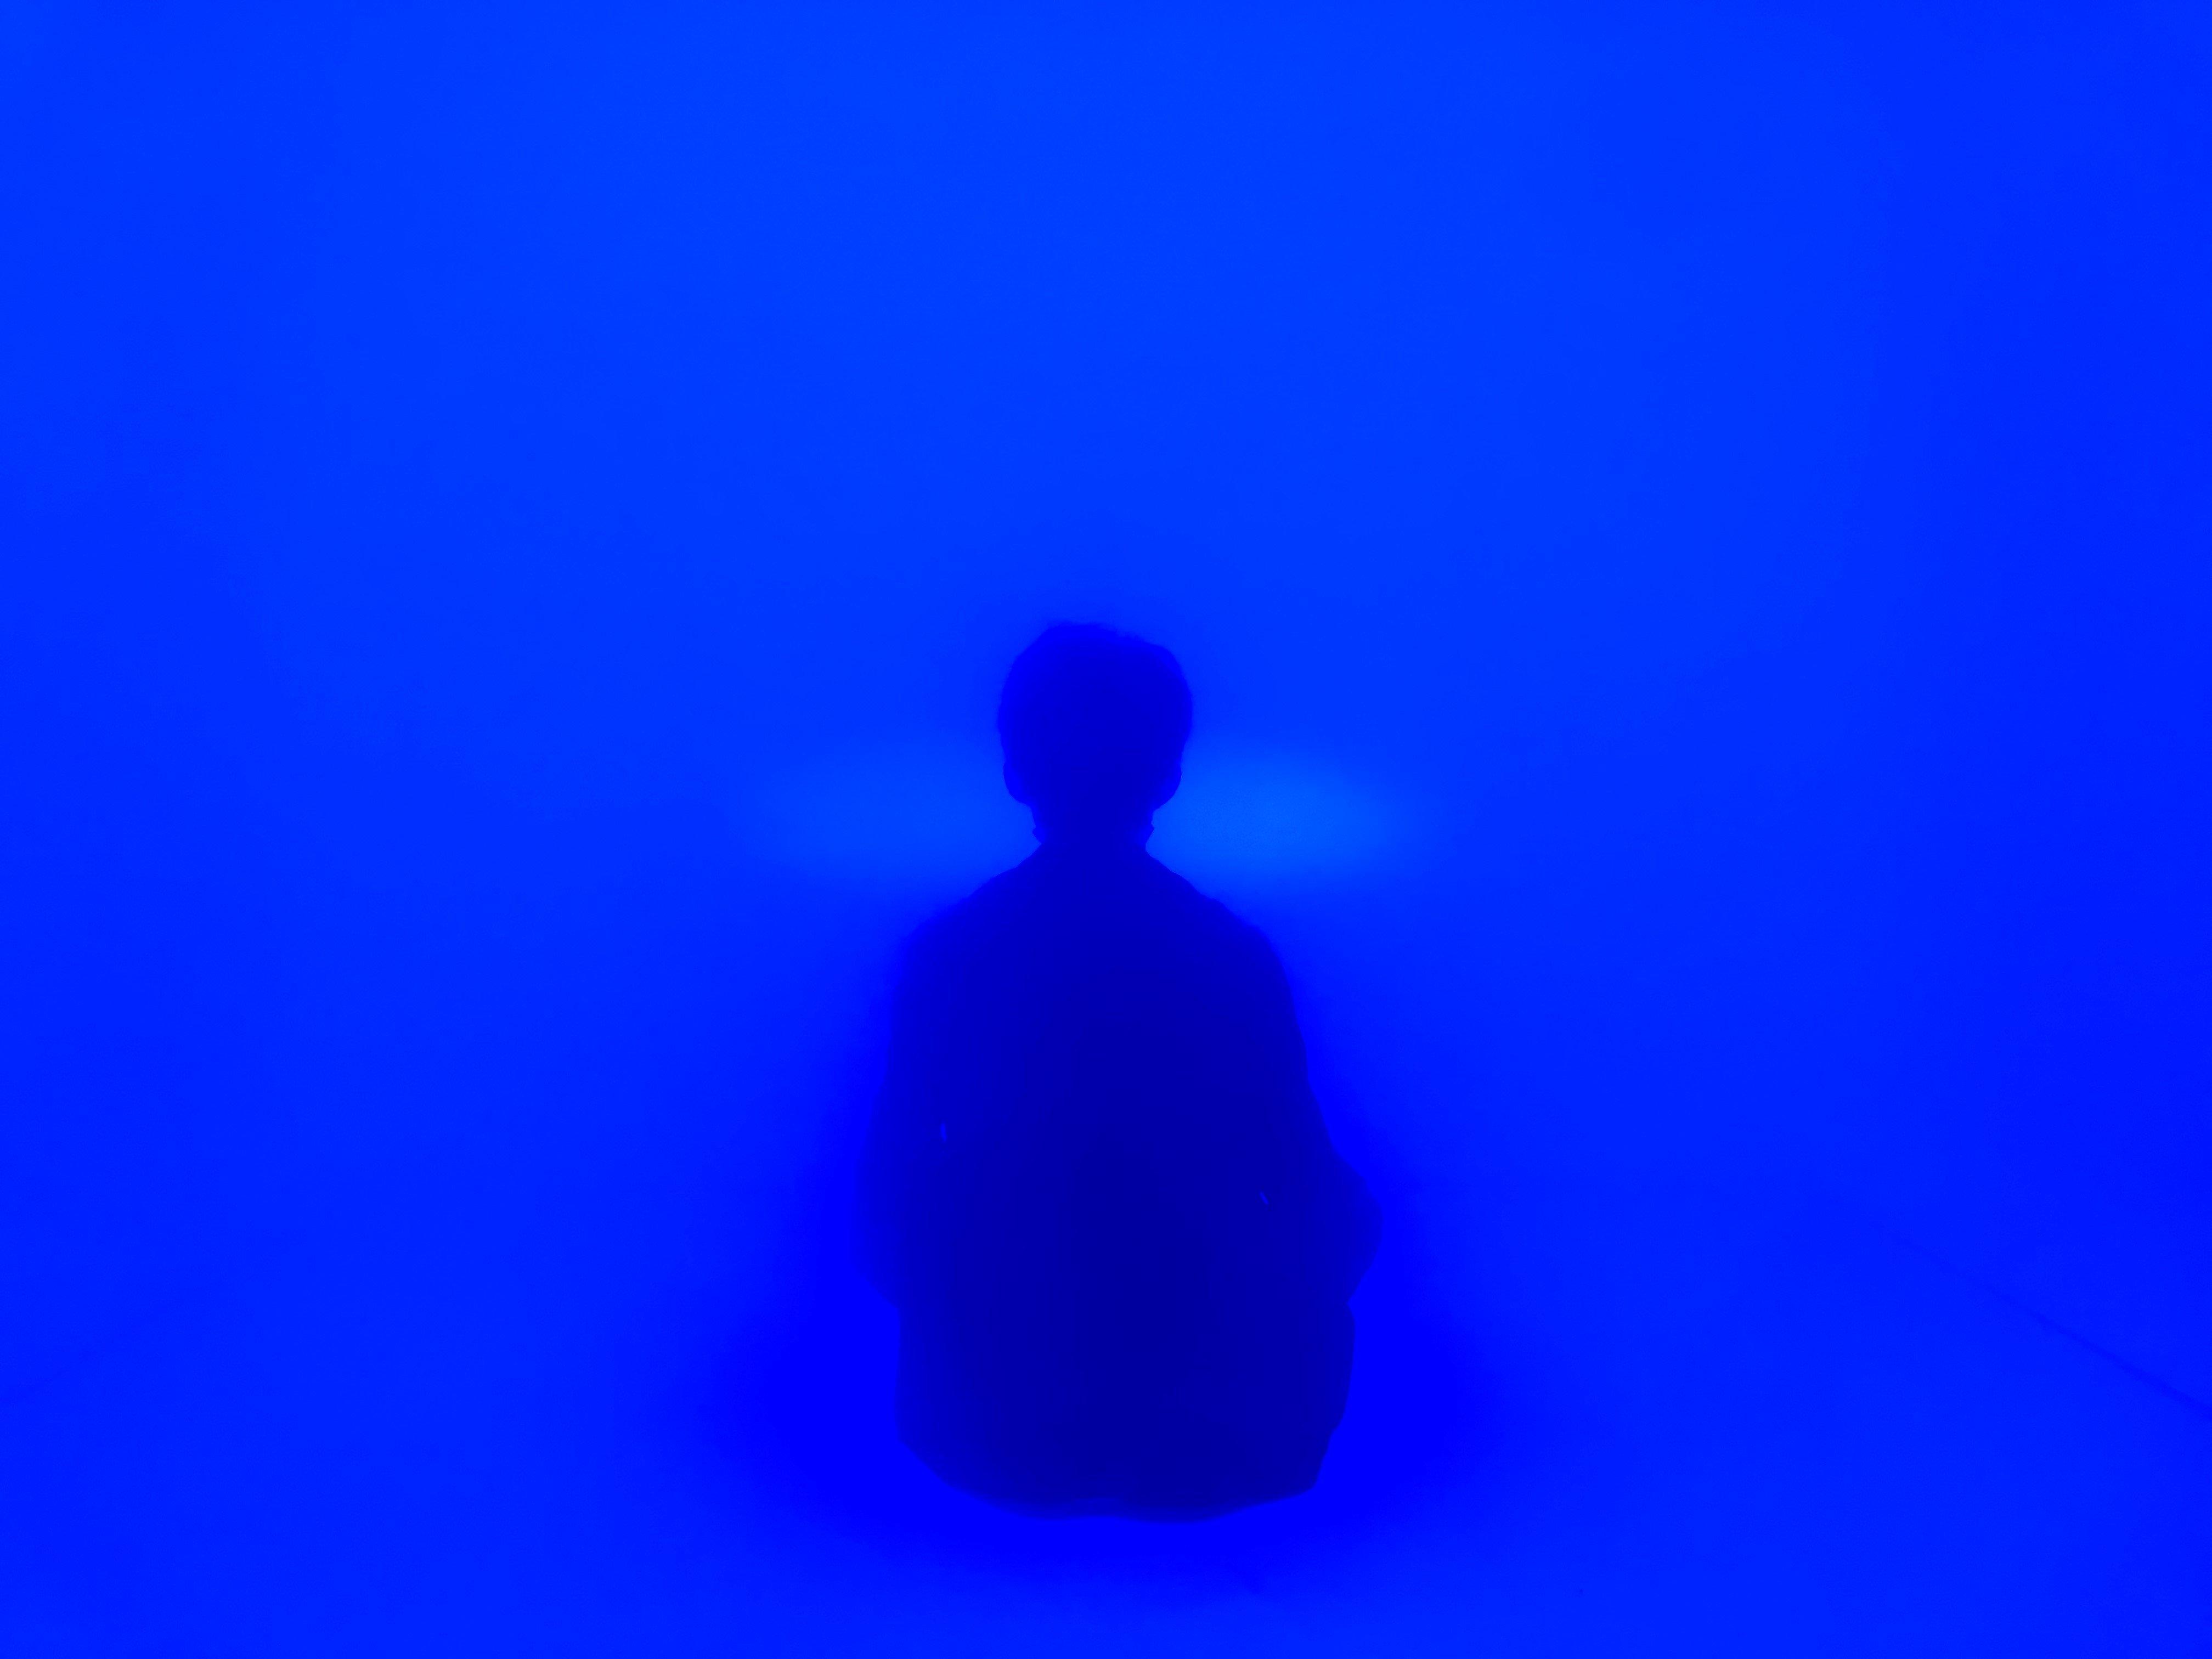 「(MU)ROOM」での瞑想(イメージ)